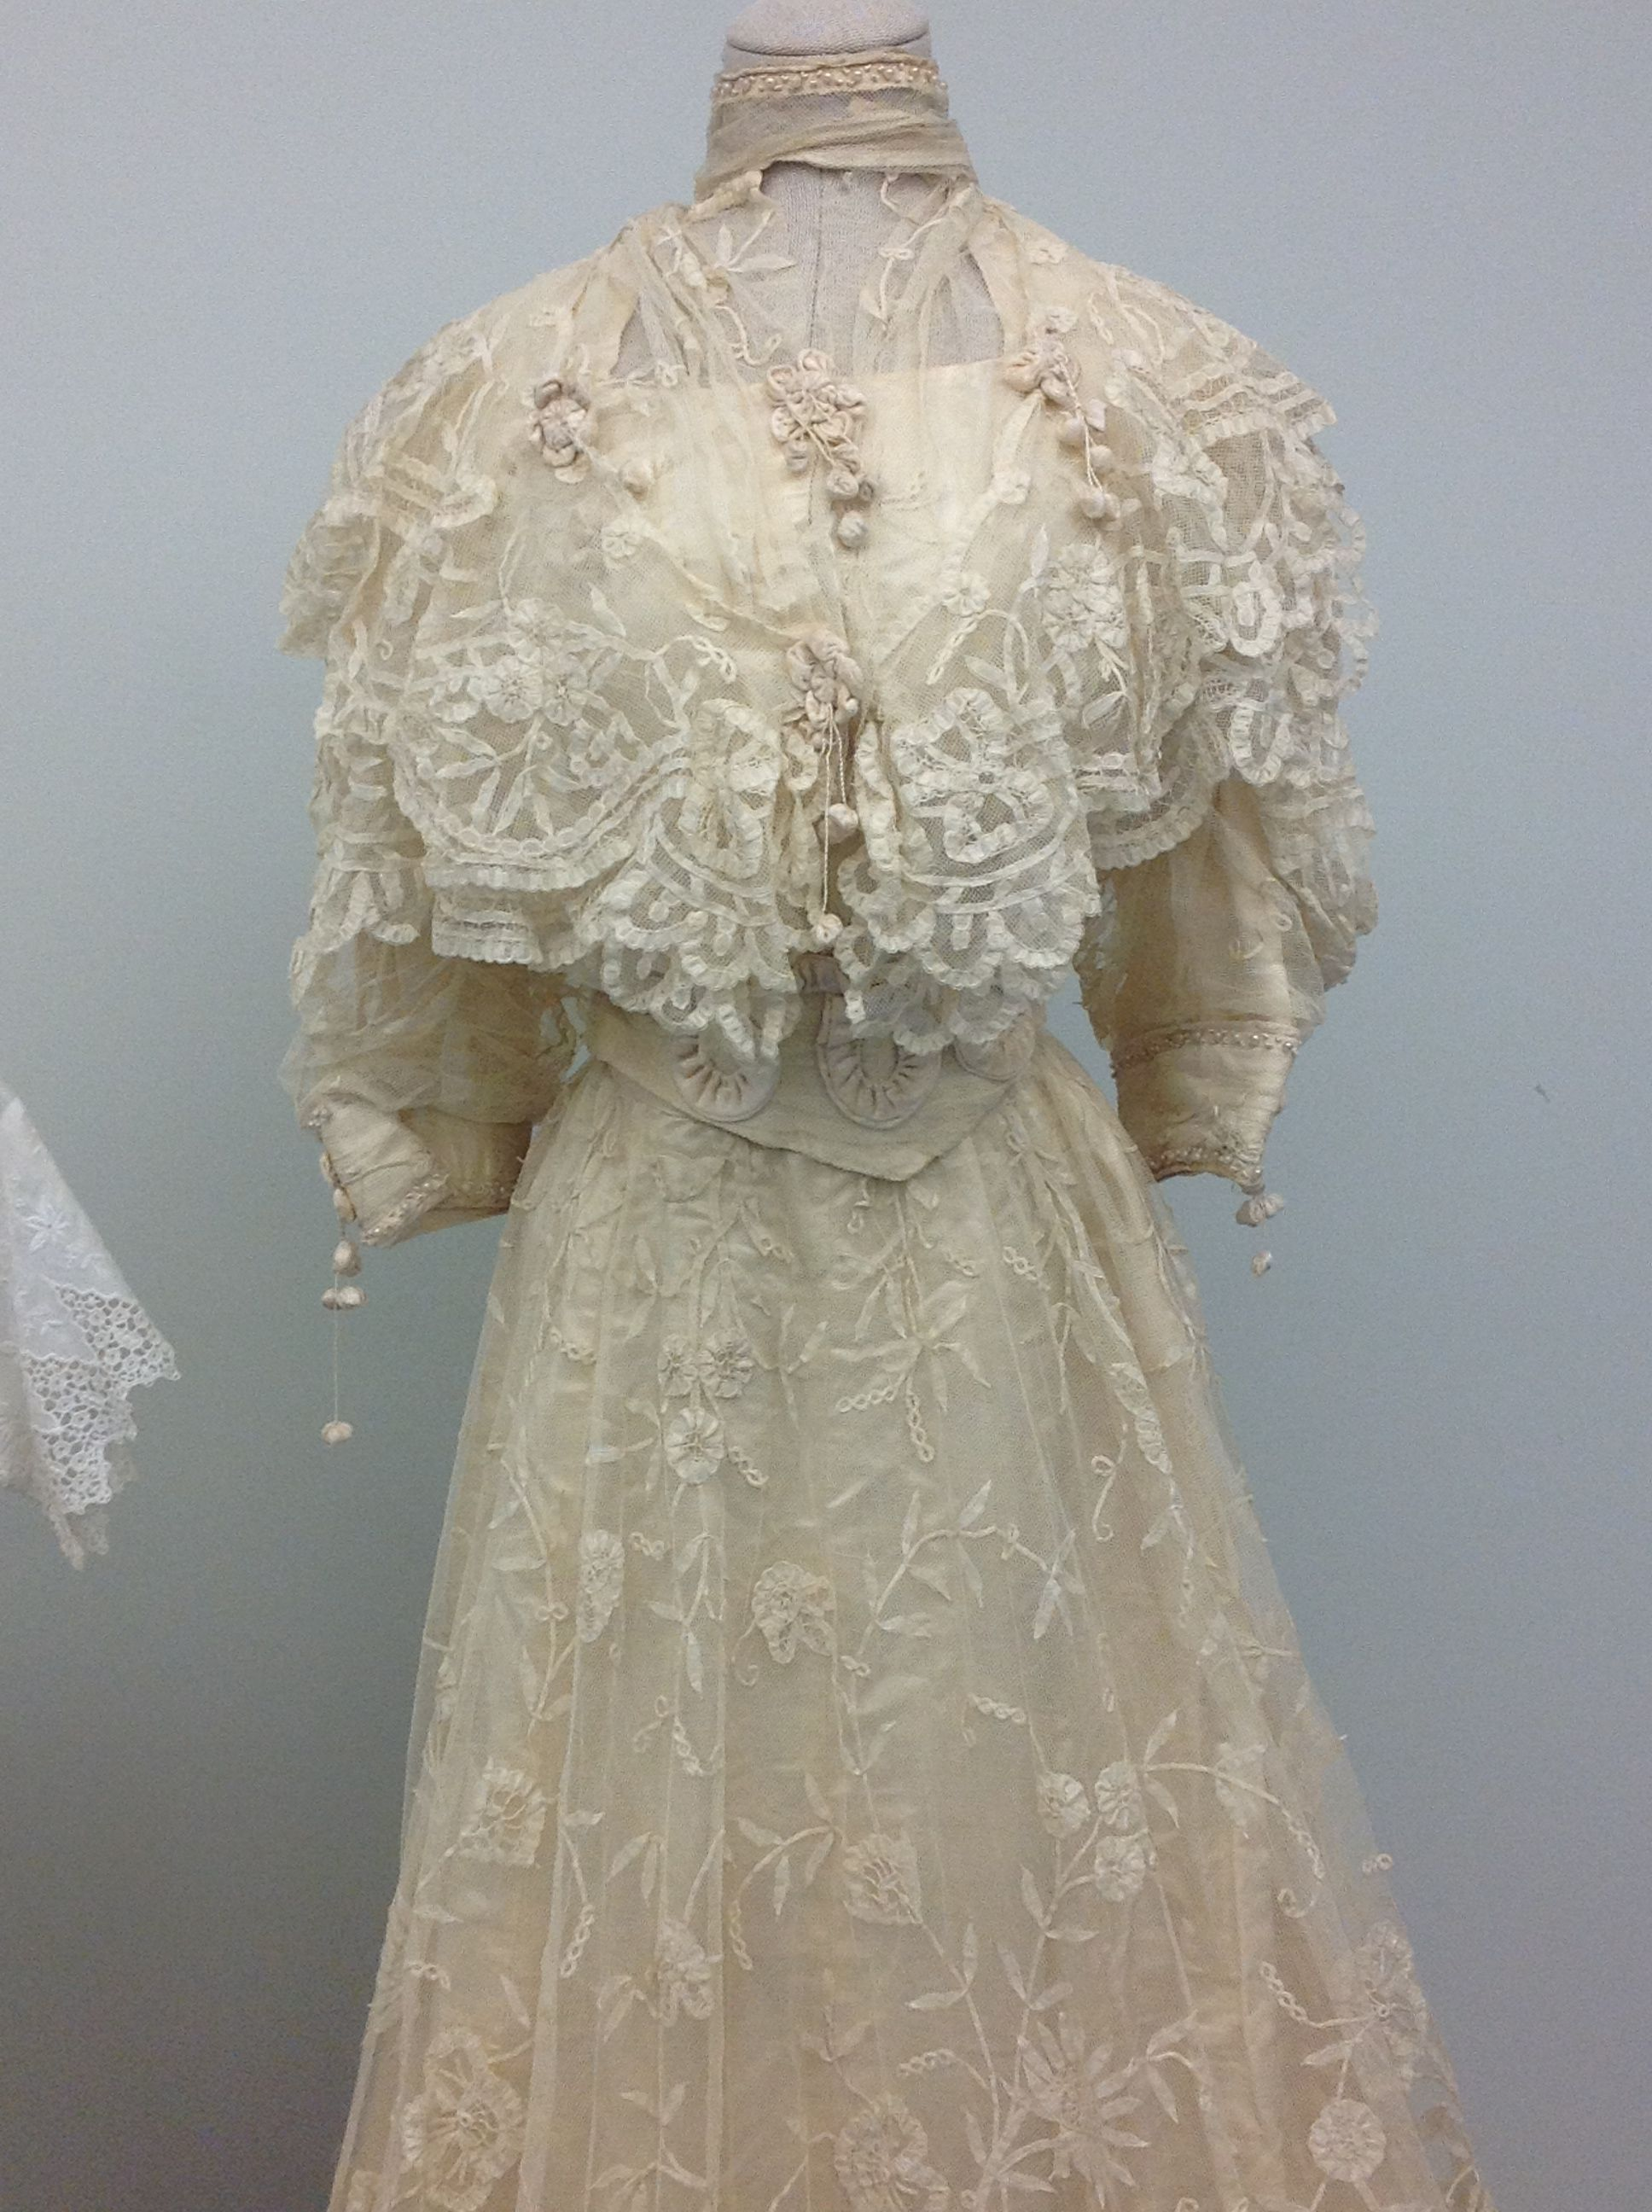 Wedding gown edwardian from seneca fashion resource centre love